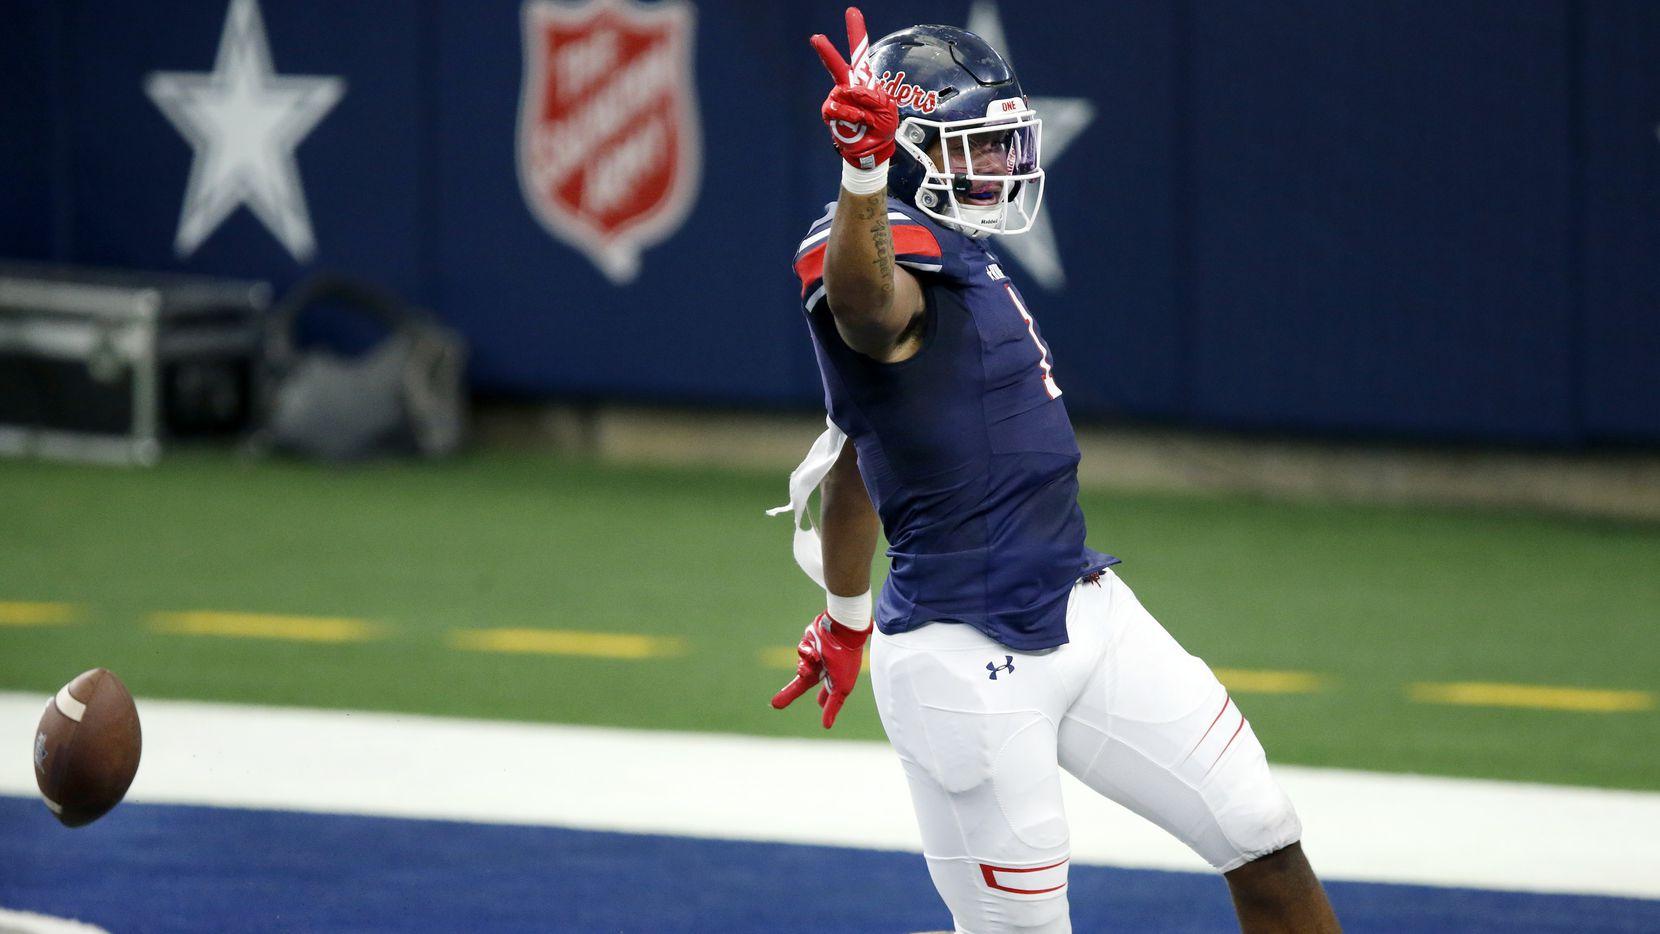 Denton Ryan receiver Ja'Tavion Sanders (1) scores a first quarter touchdown on a long catch and run against Arlington Martin at AT&T Stadium in Arlington, Friday, September 25, 2020. (Tom Fox/The Dallas Morning News)